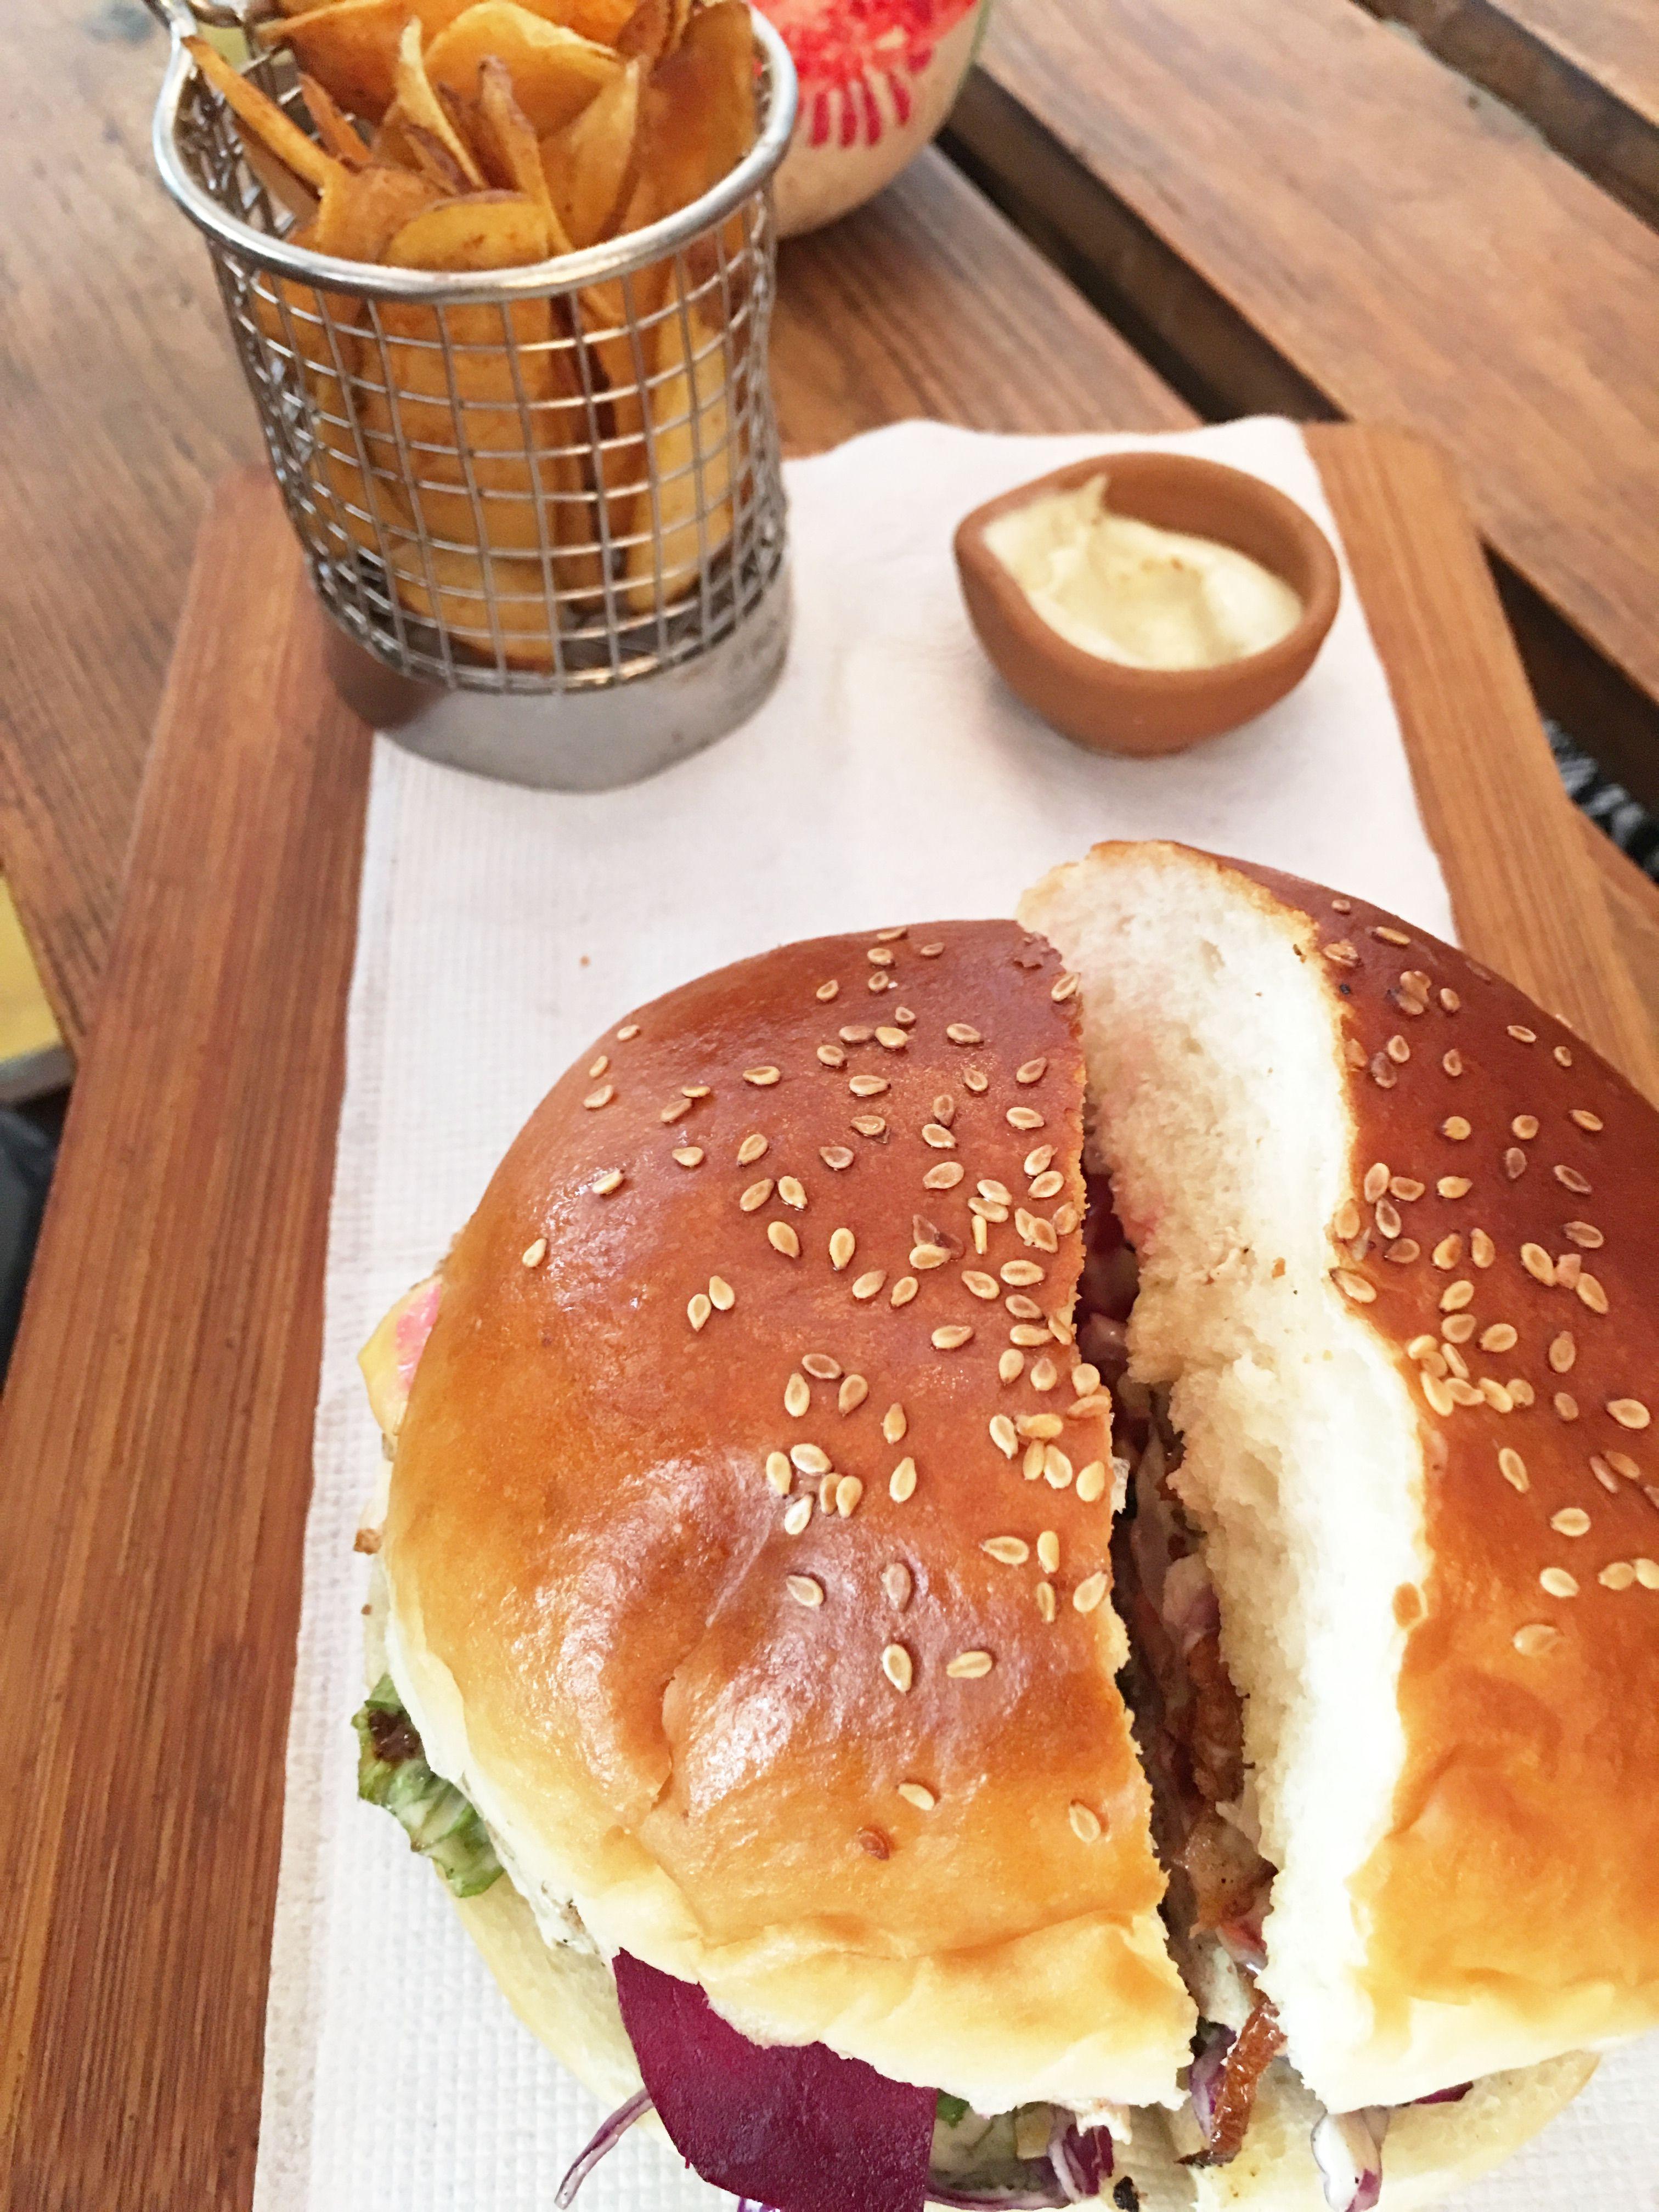 Burger factory goa churning out fresh burgers